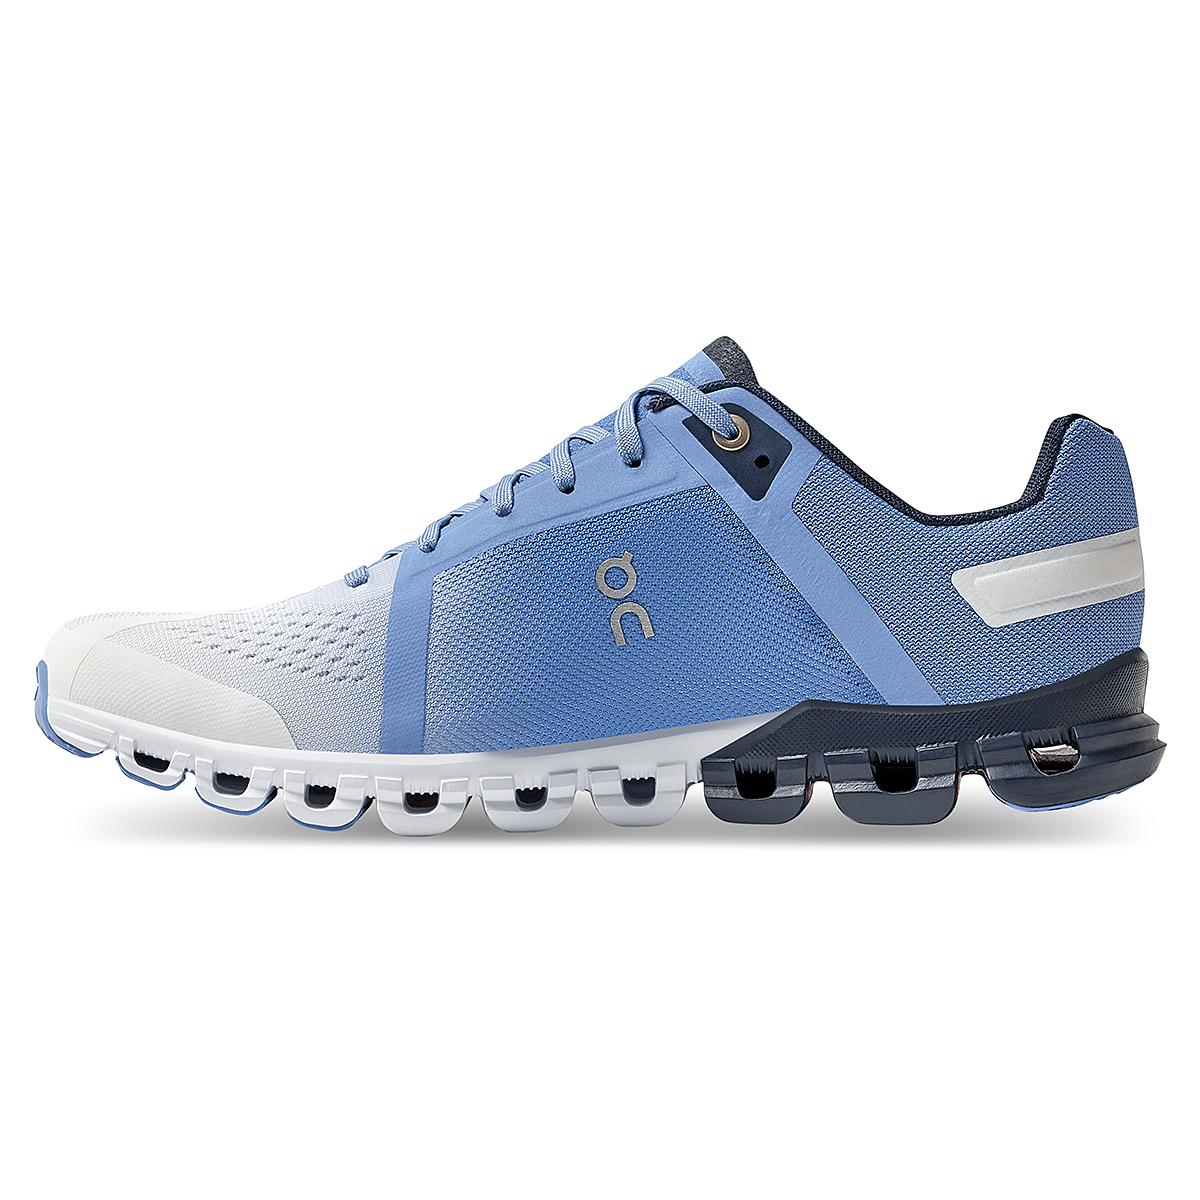 Women's On Cloudflow 3.0 Running Shoe - Color: Marina/White - Size: 5 - Width: Regular, Marina/White, large, image 3